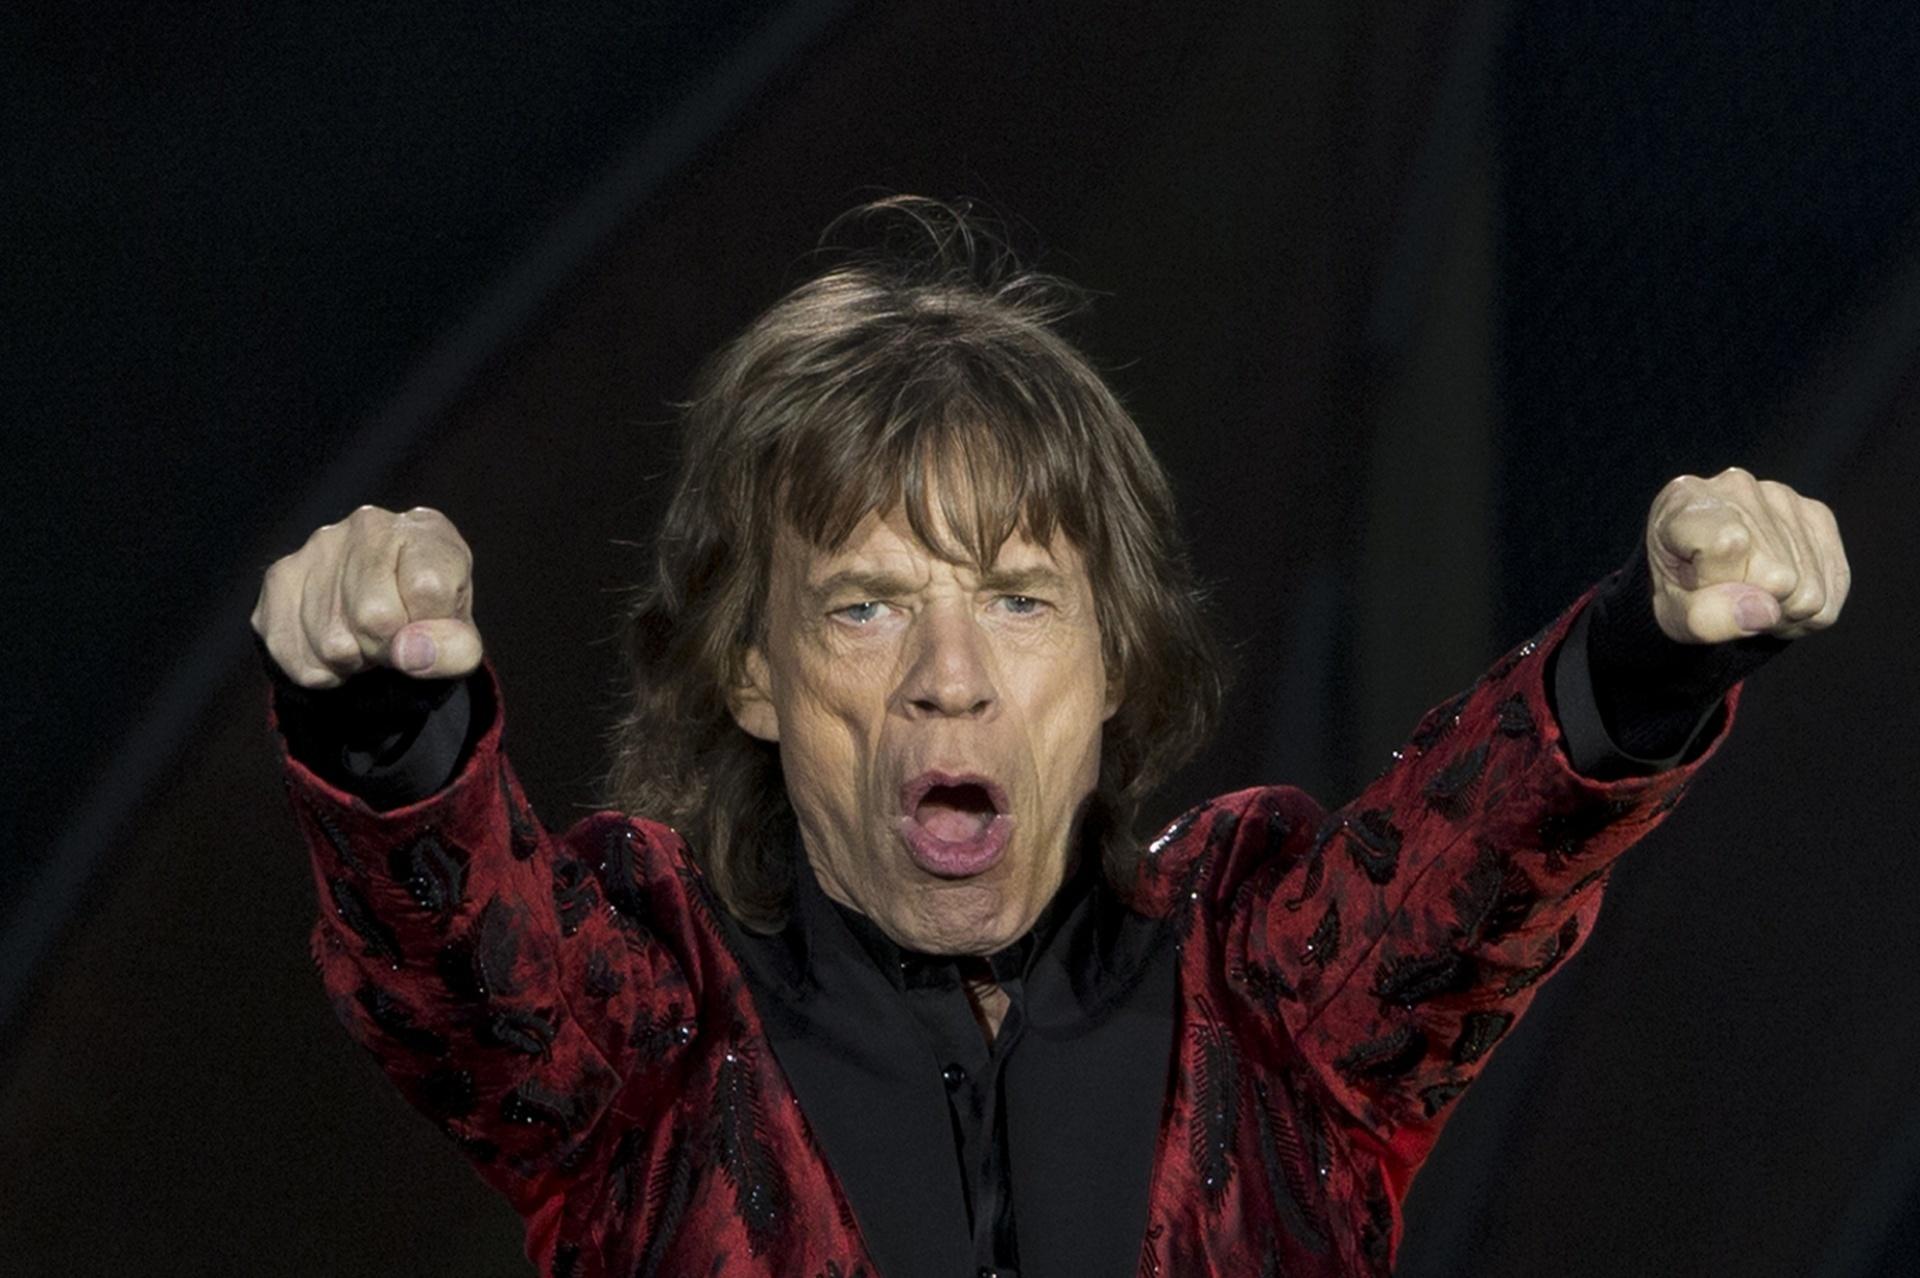 Mick Jagger (stock image).